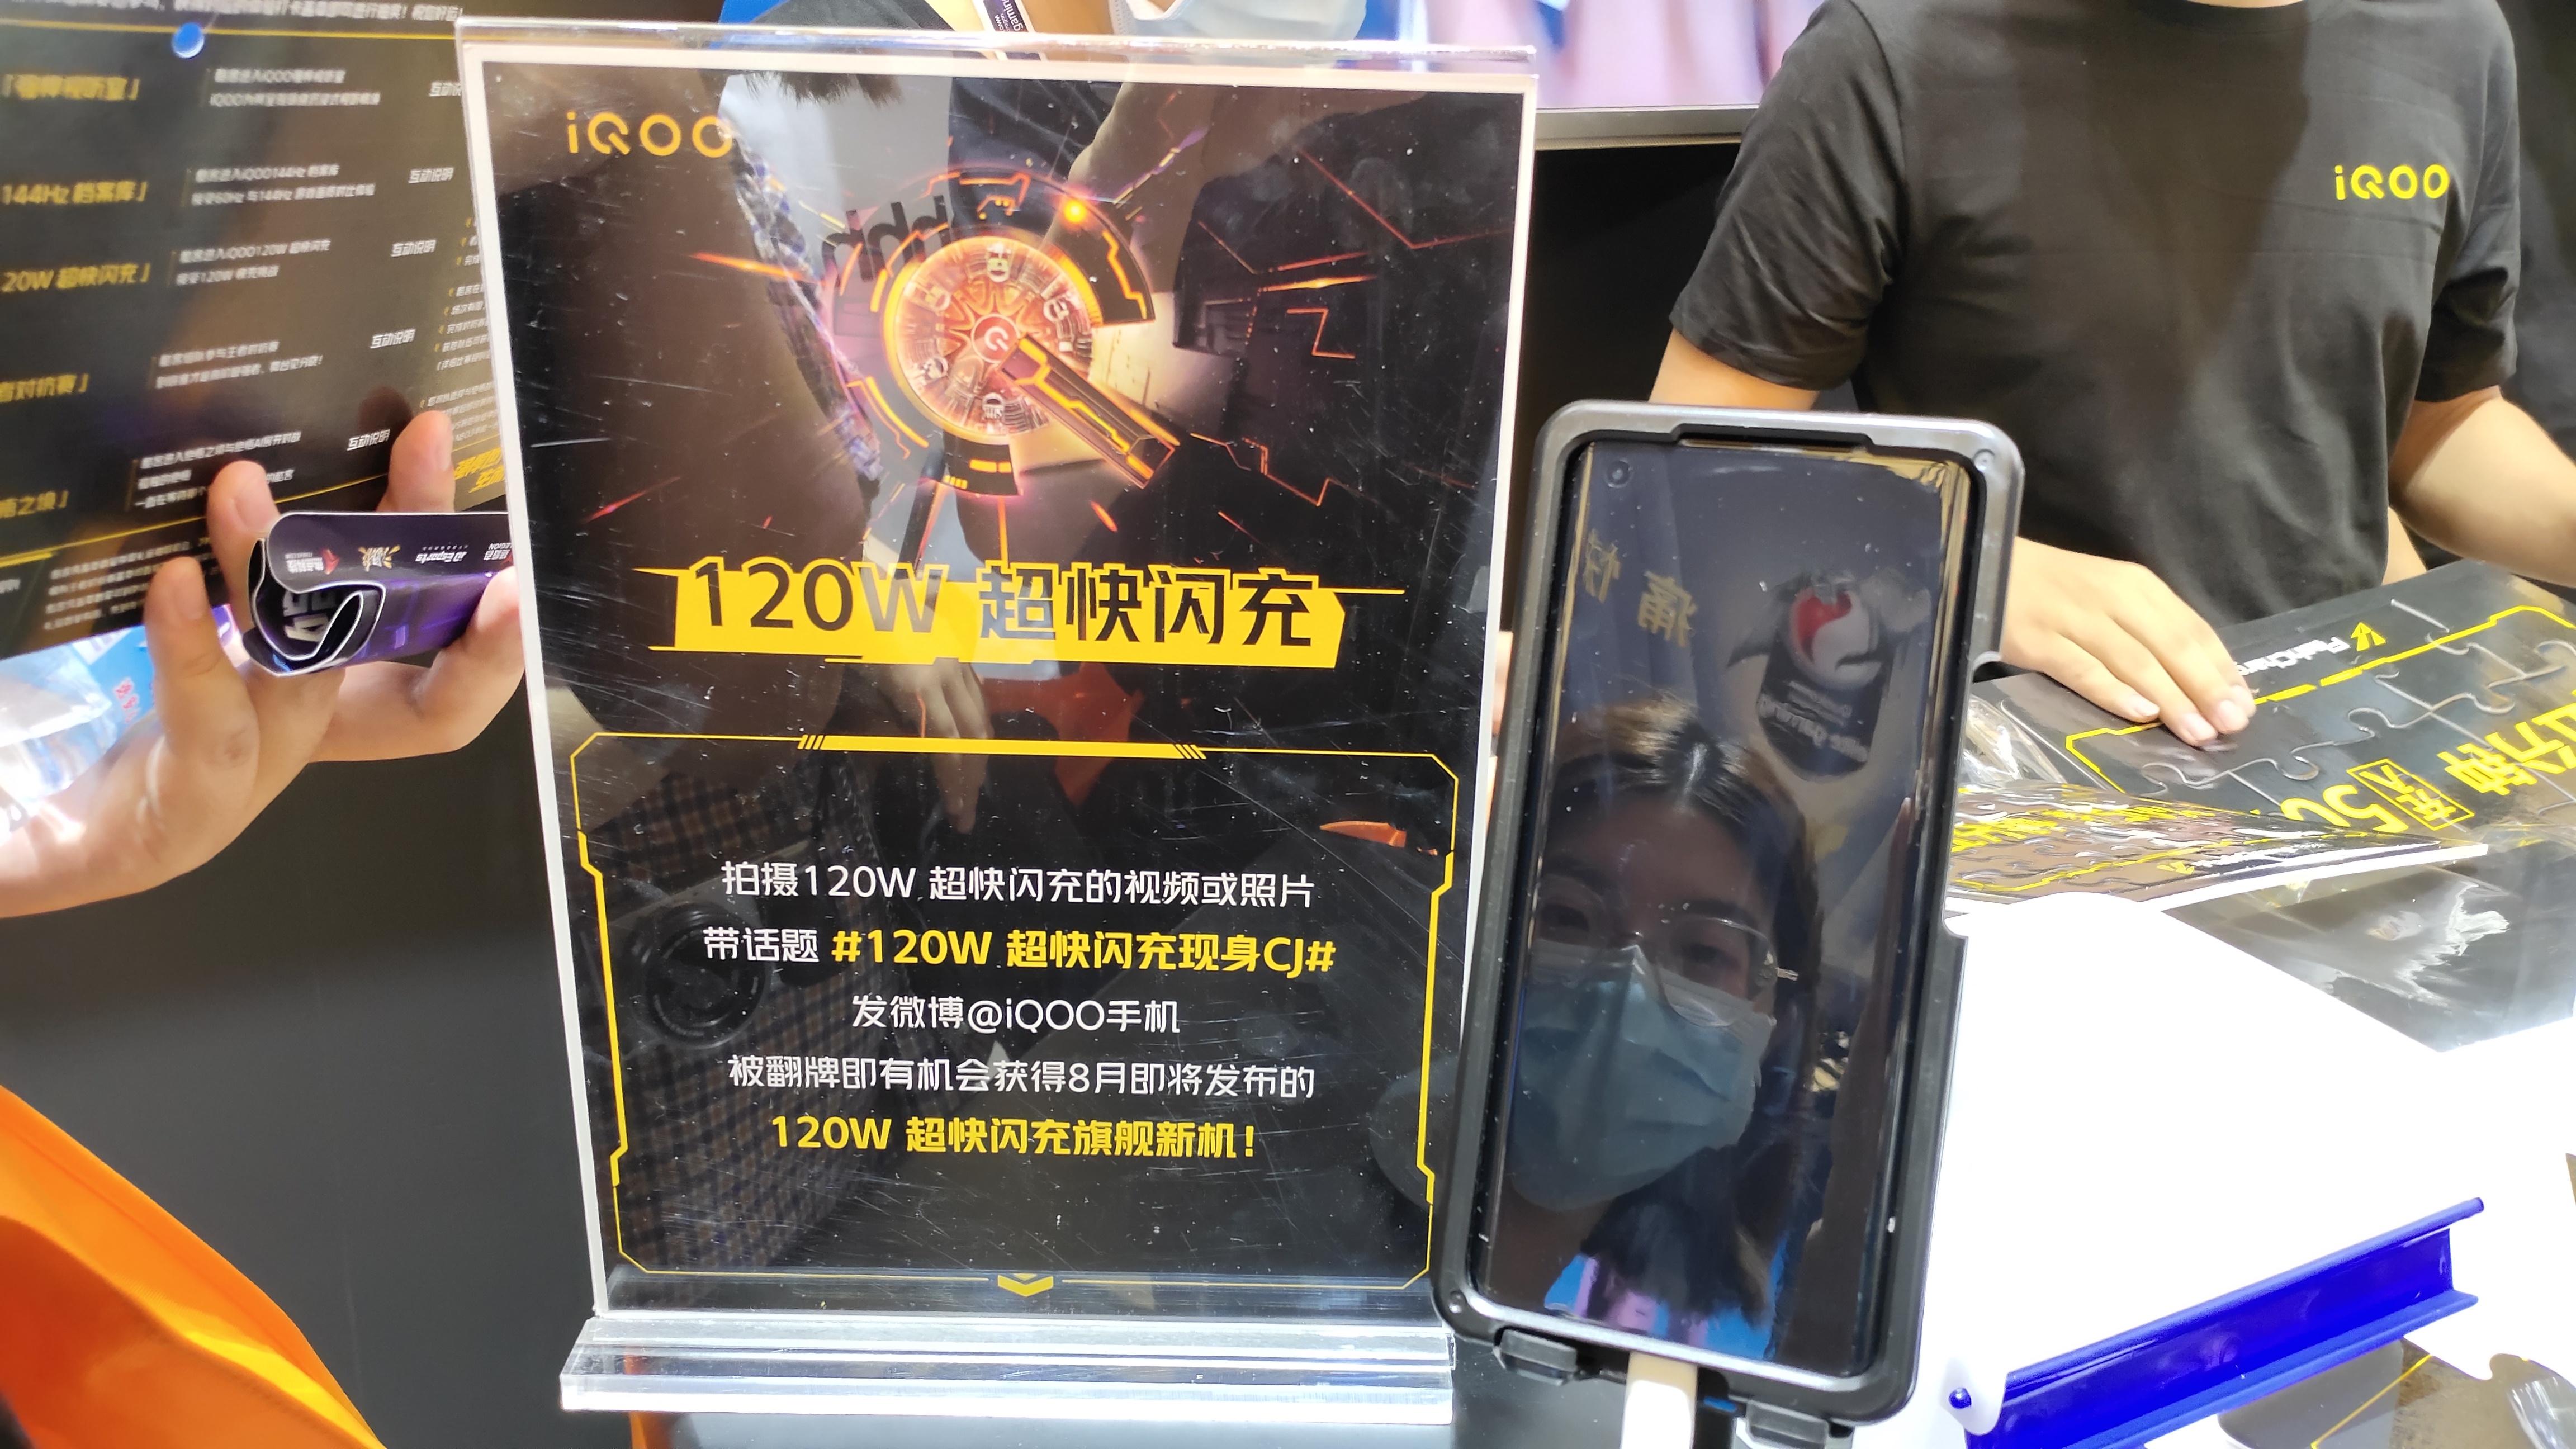 iQOO和OPPO在ChinaJoy上展示了他们的超快速充电技术